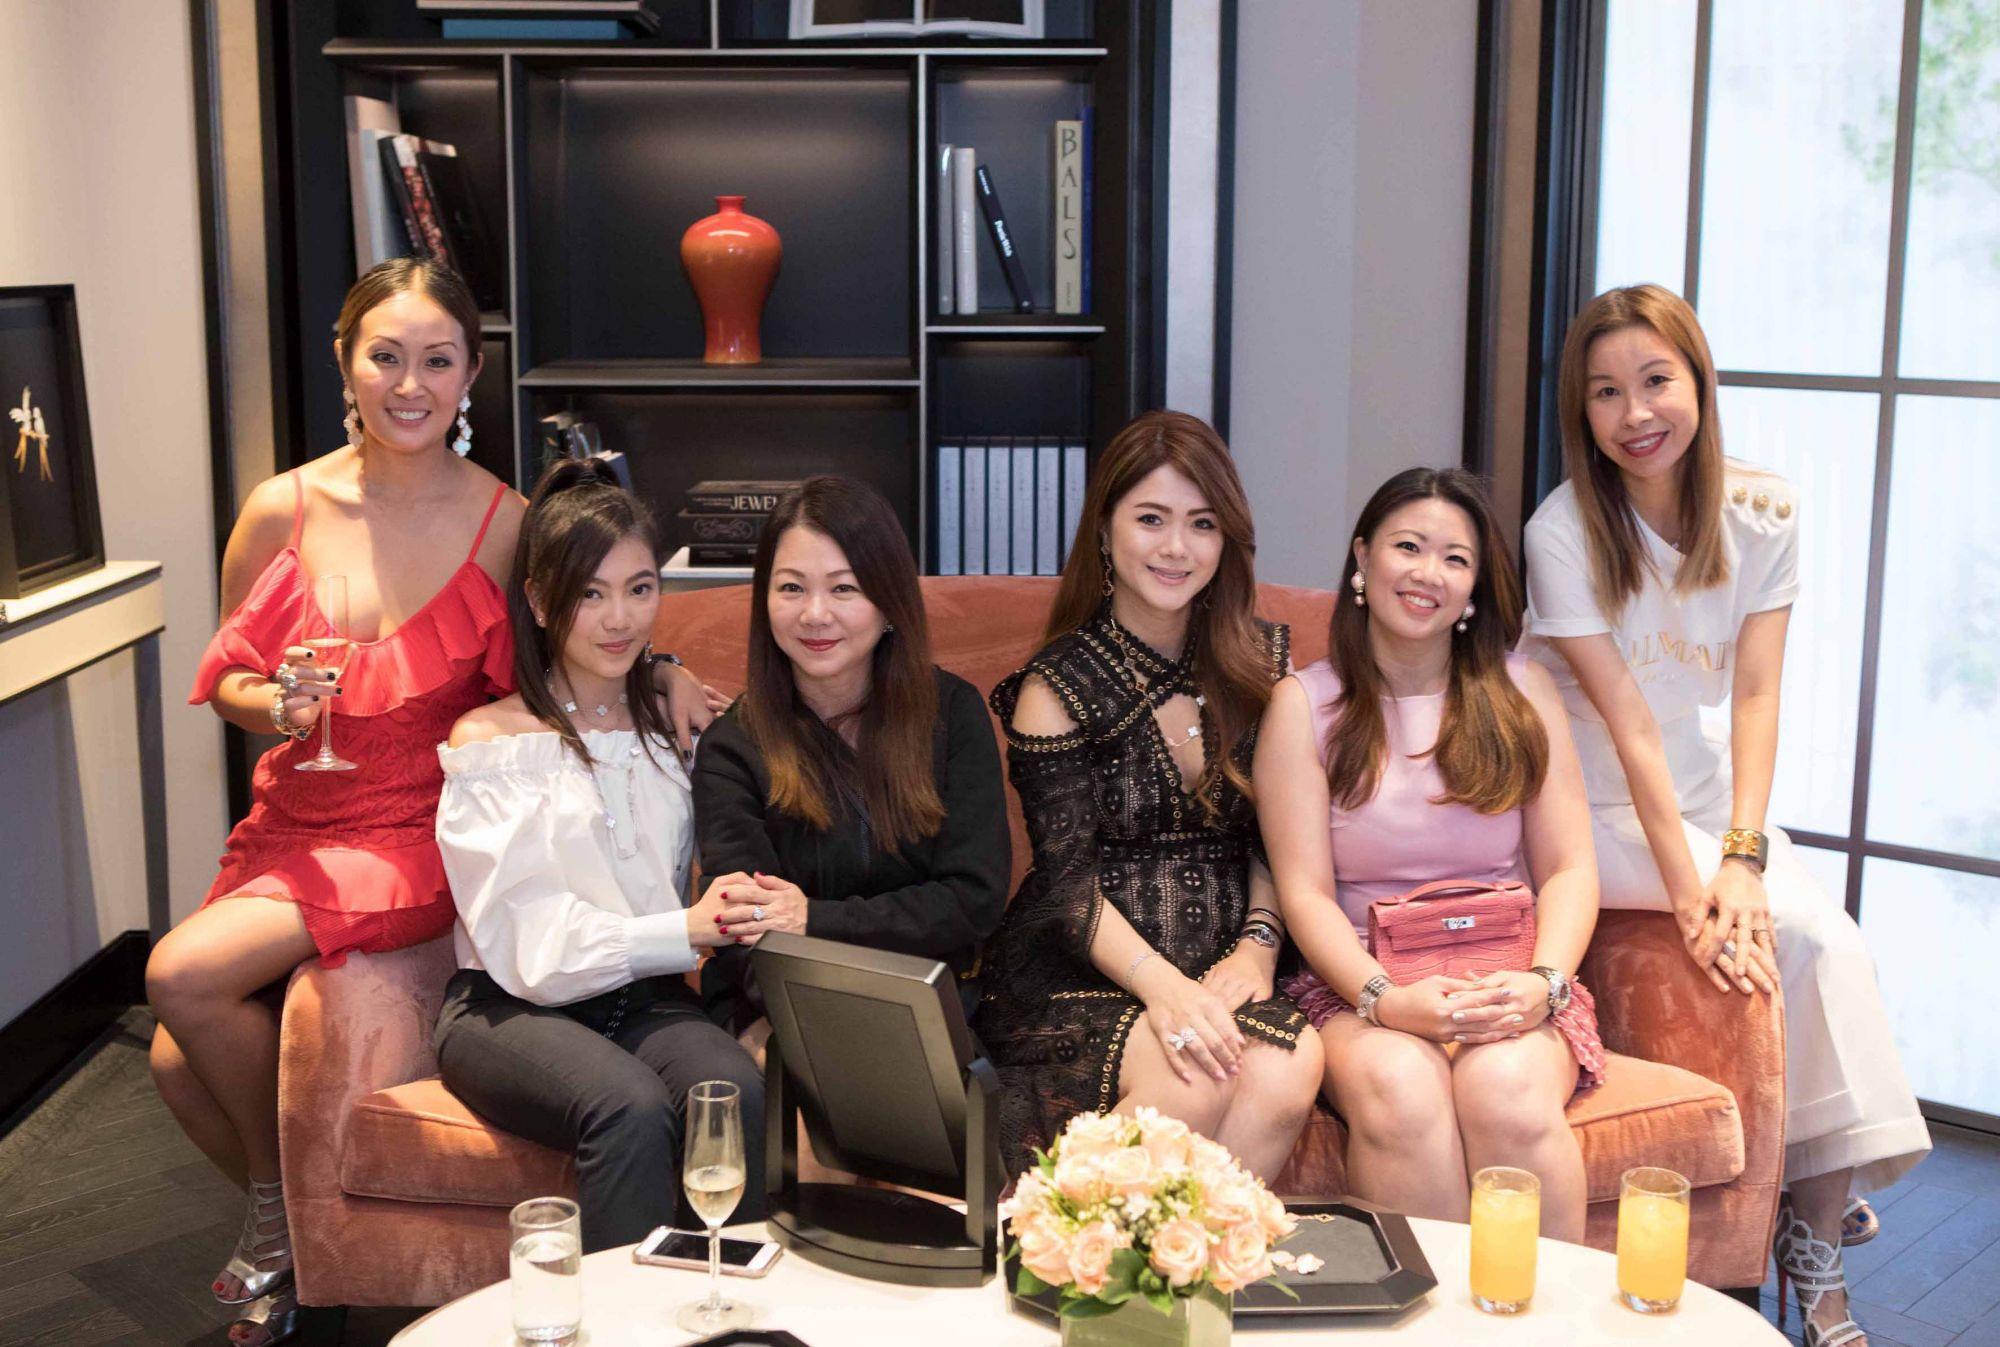 Serene Chua, Adeline Teo, Angela Ng, Chermaine Pang, Siow Yin Yin, Stephanie Tay